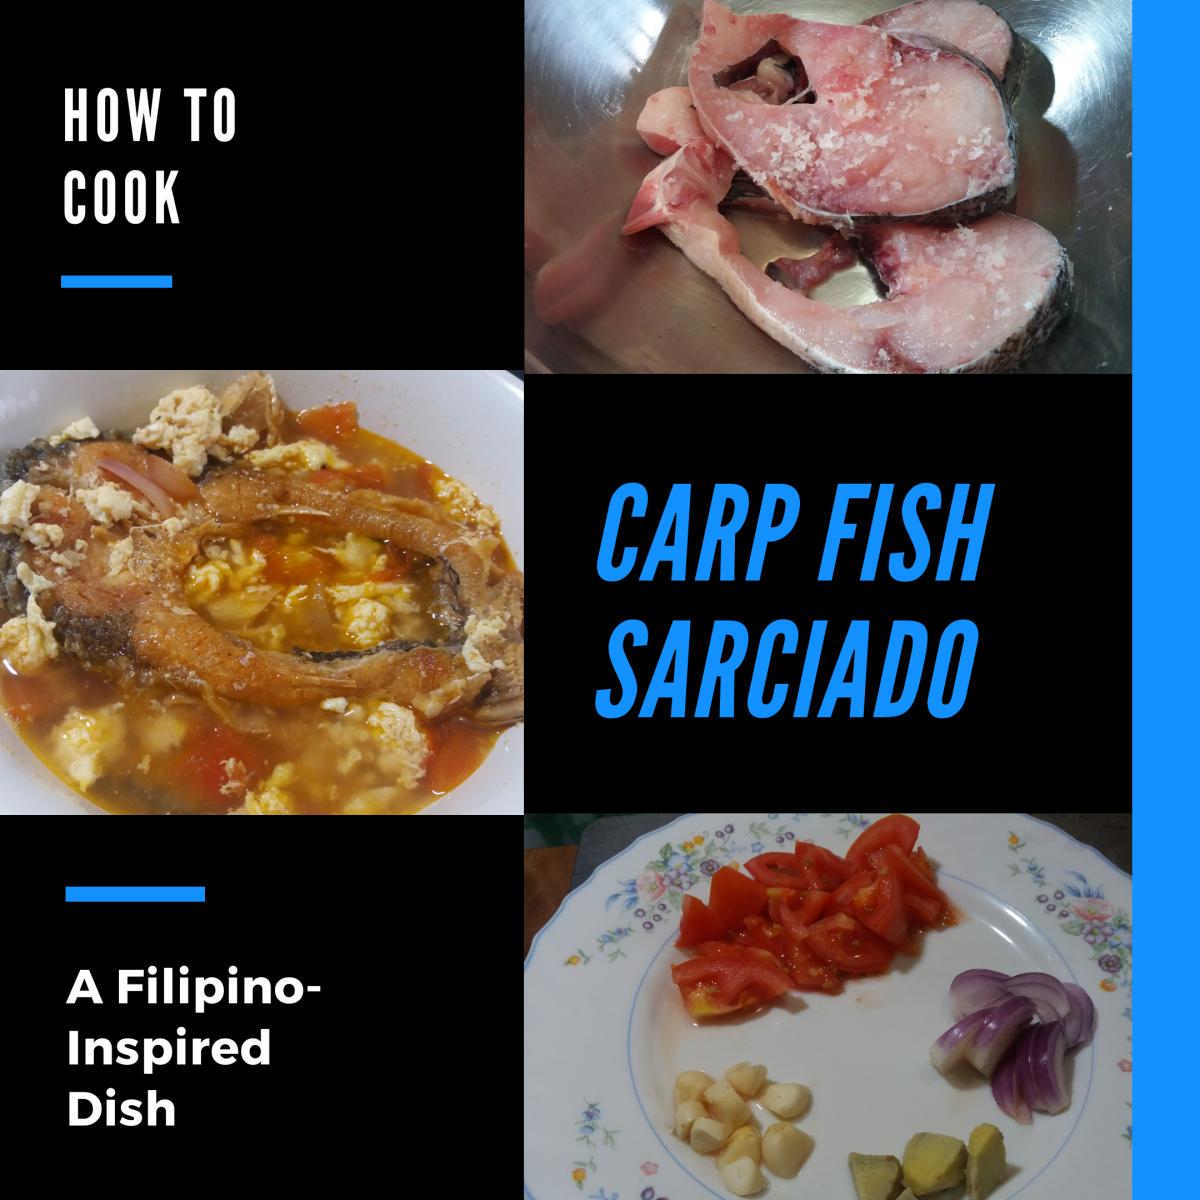 Learn how to prepare carp fish sarciado.